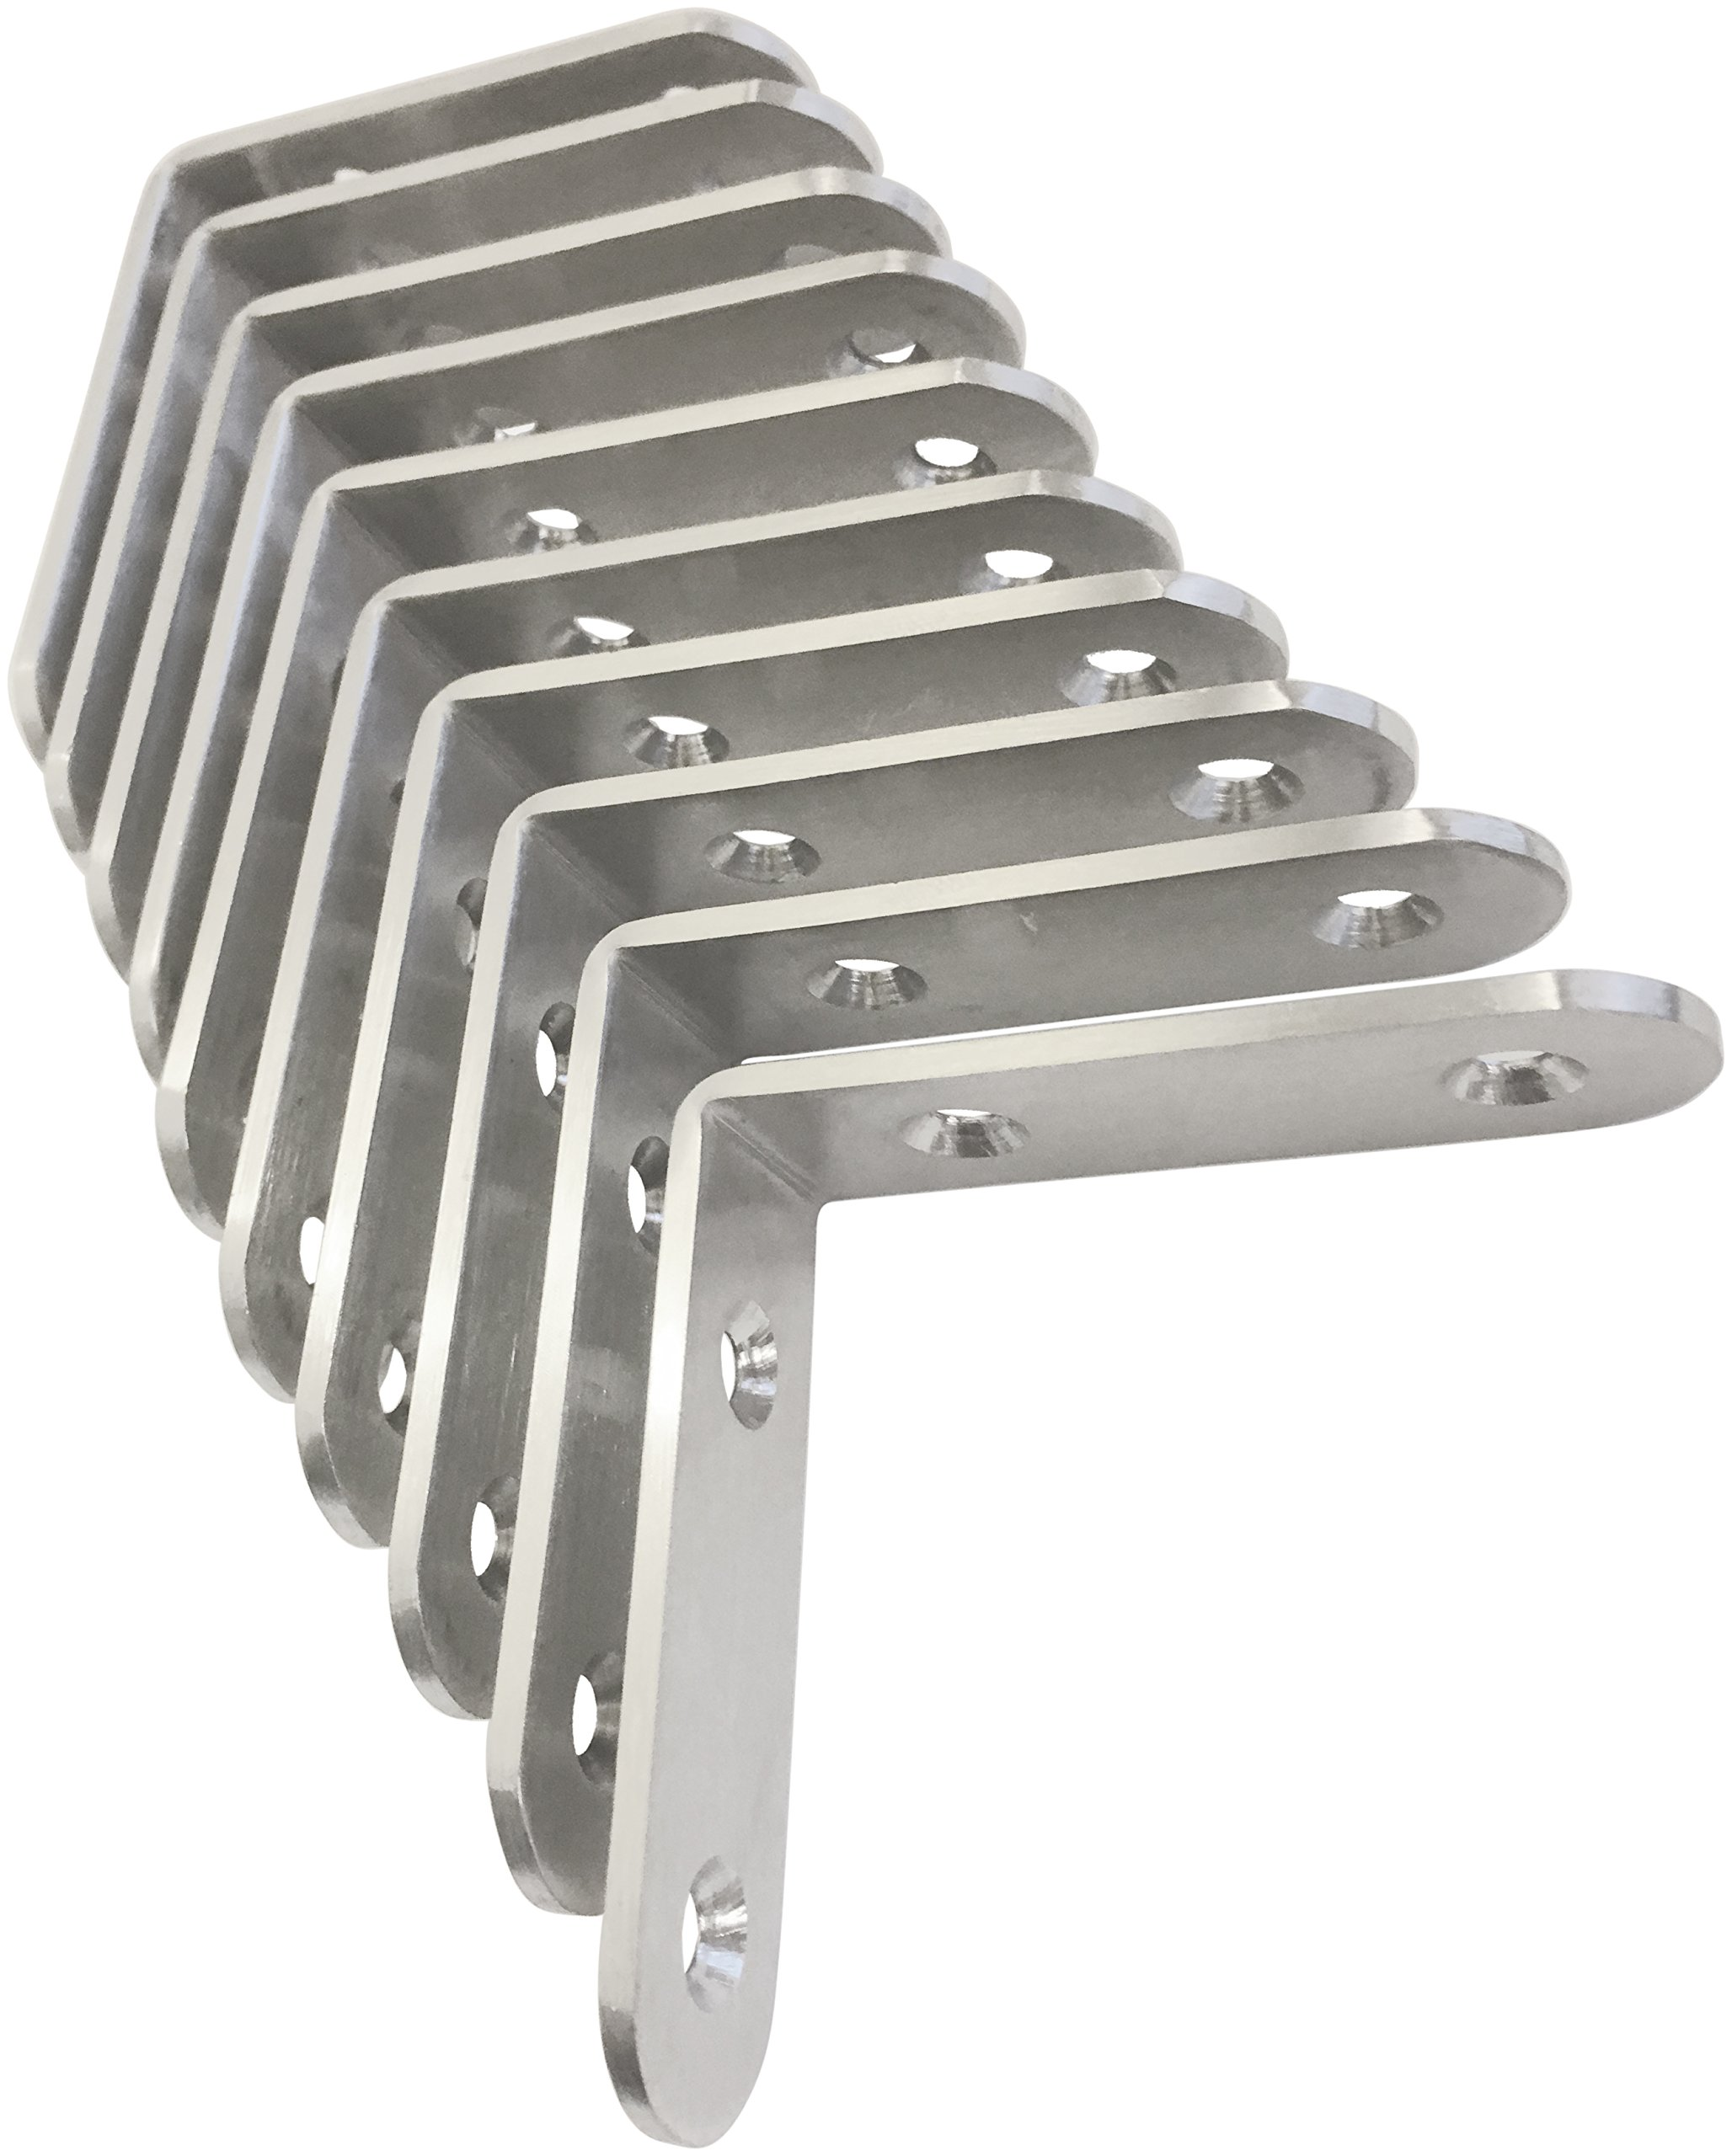 Corner Brace Set (Also know as - Corner Braces, L Bracket, angle Brackets, Right angle bracket, L shaped bracket, angle brace, metal angle brackets, angle brackets, angle support brackets) by TEJATAN